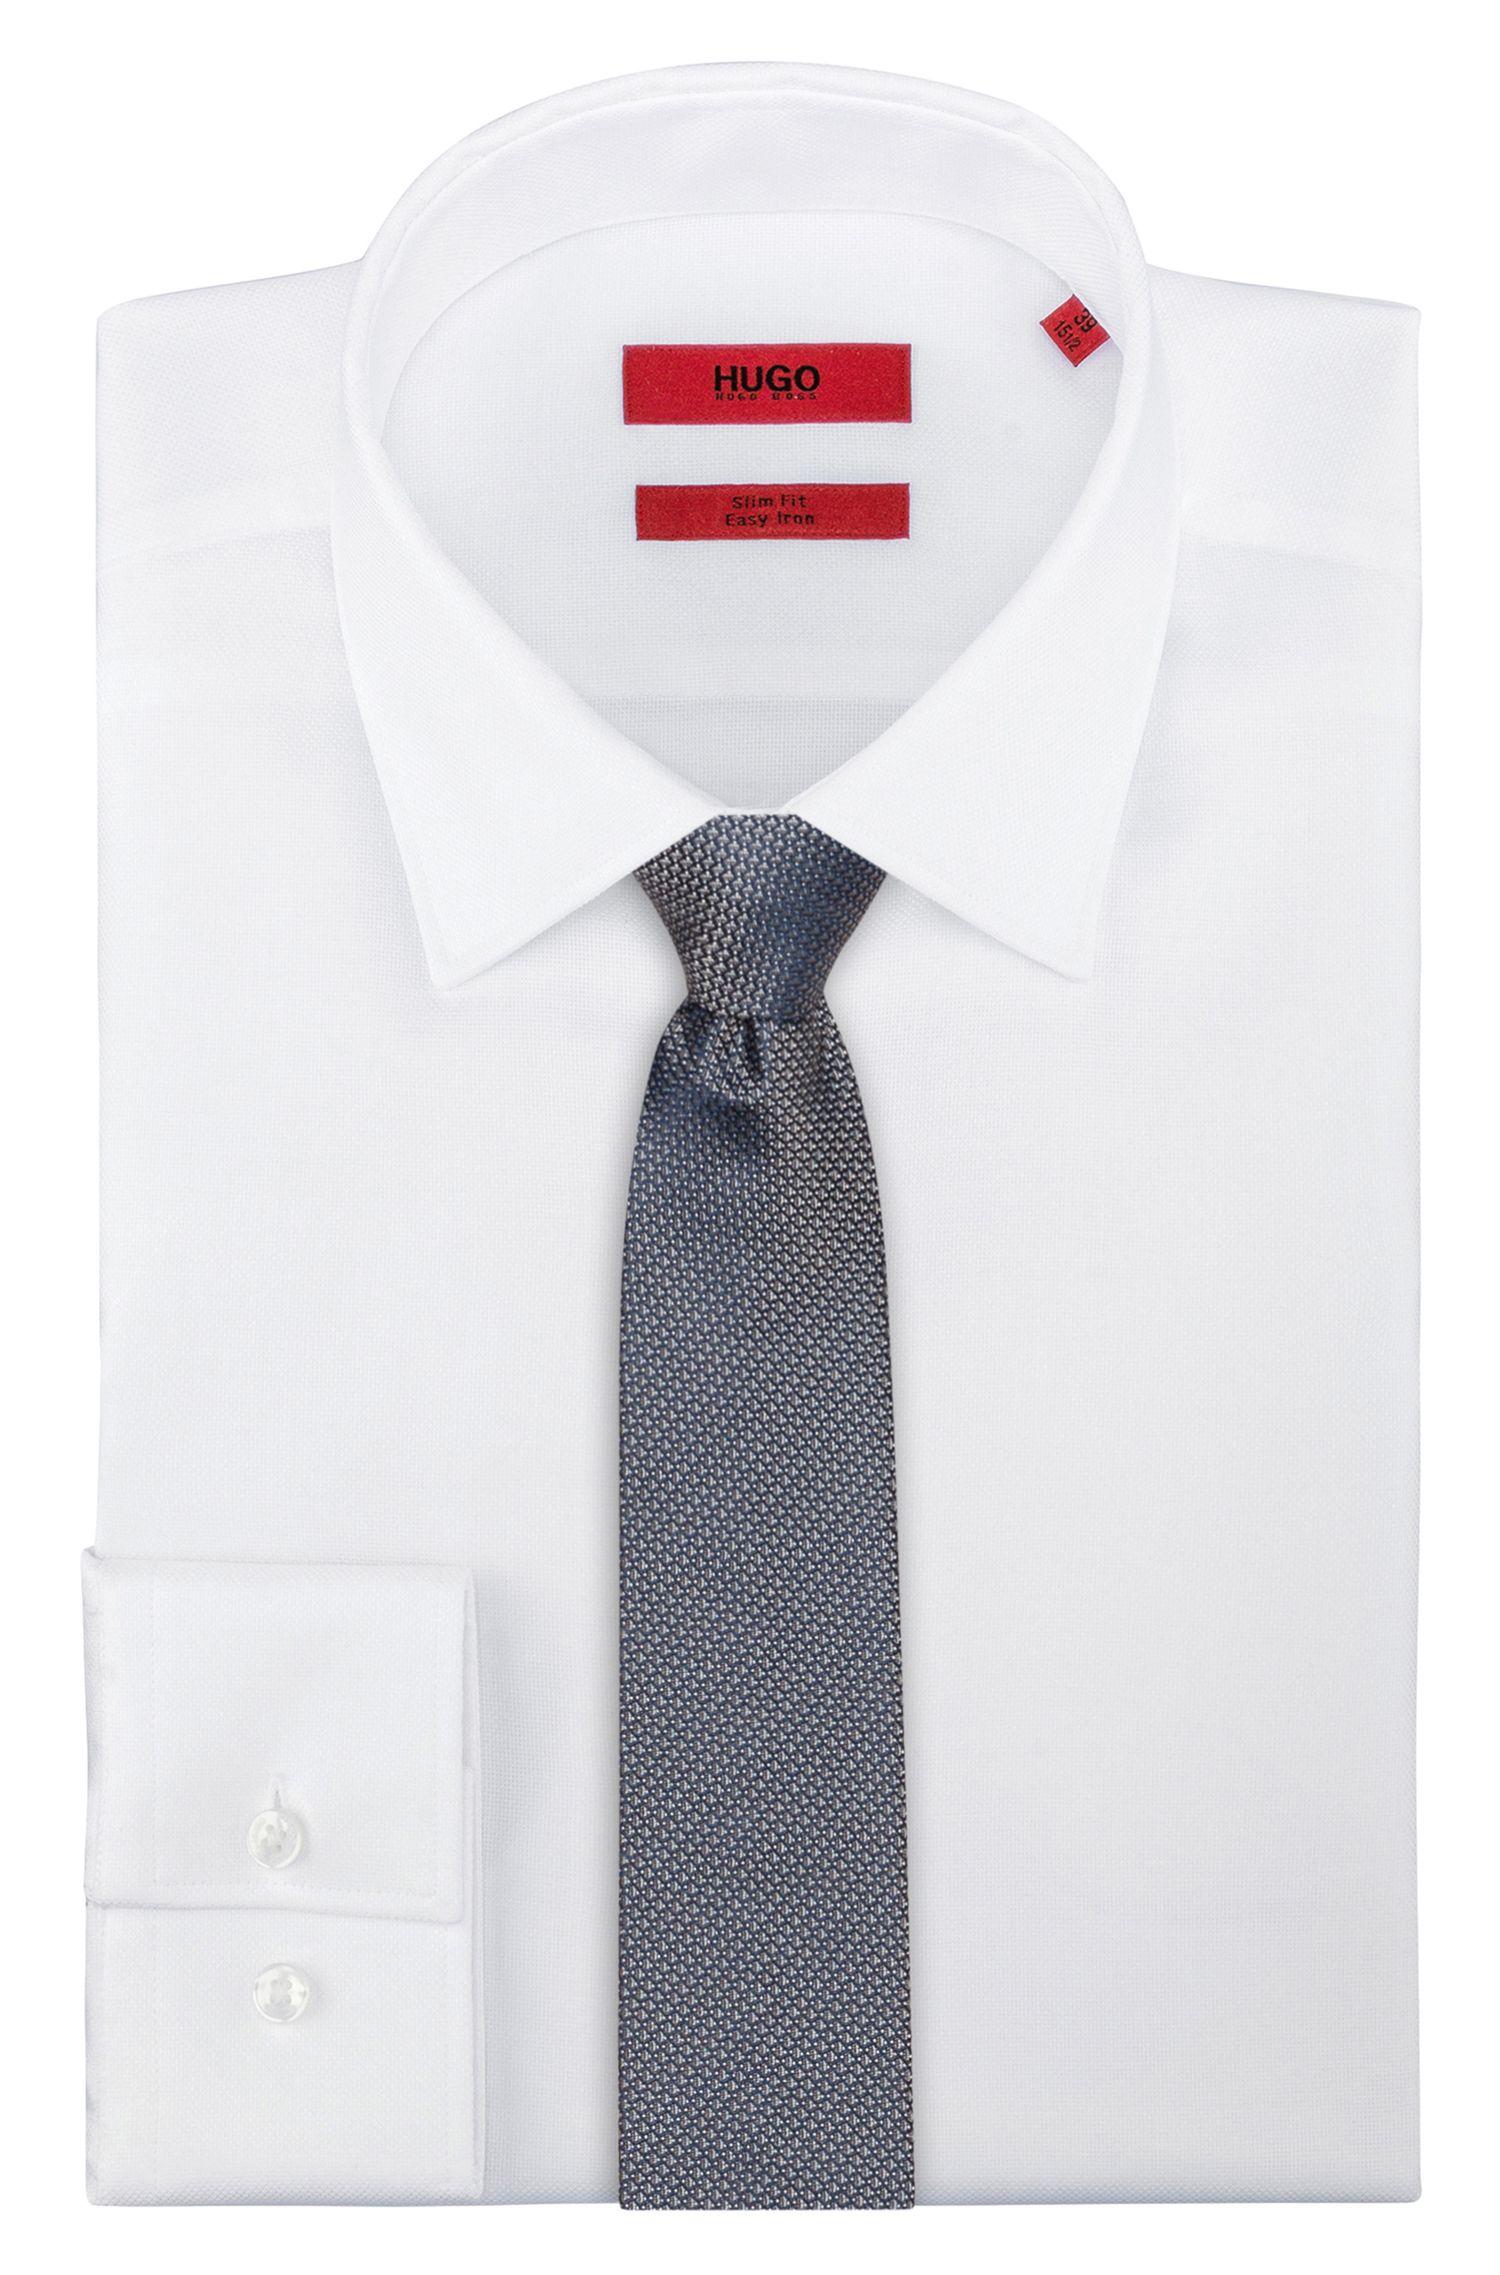 Krawatte aus Seiden-Jacquard mit filigranem Muster, Dunkelblau